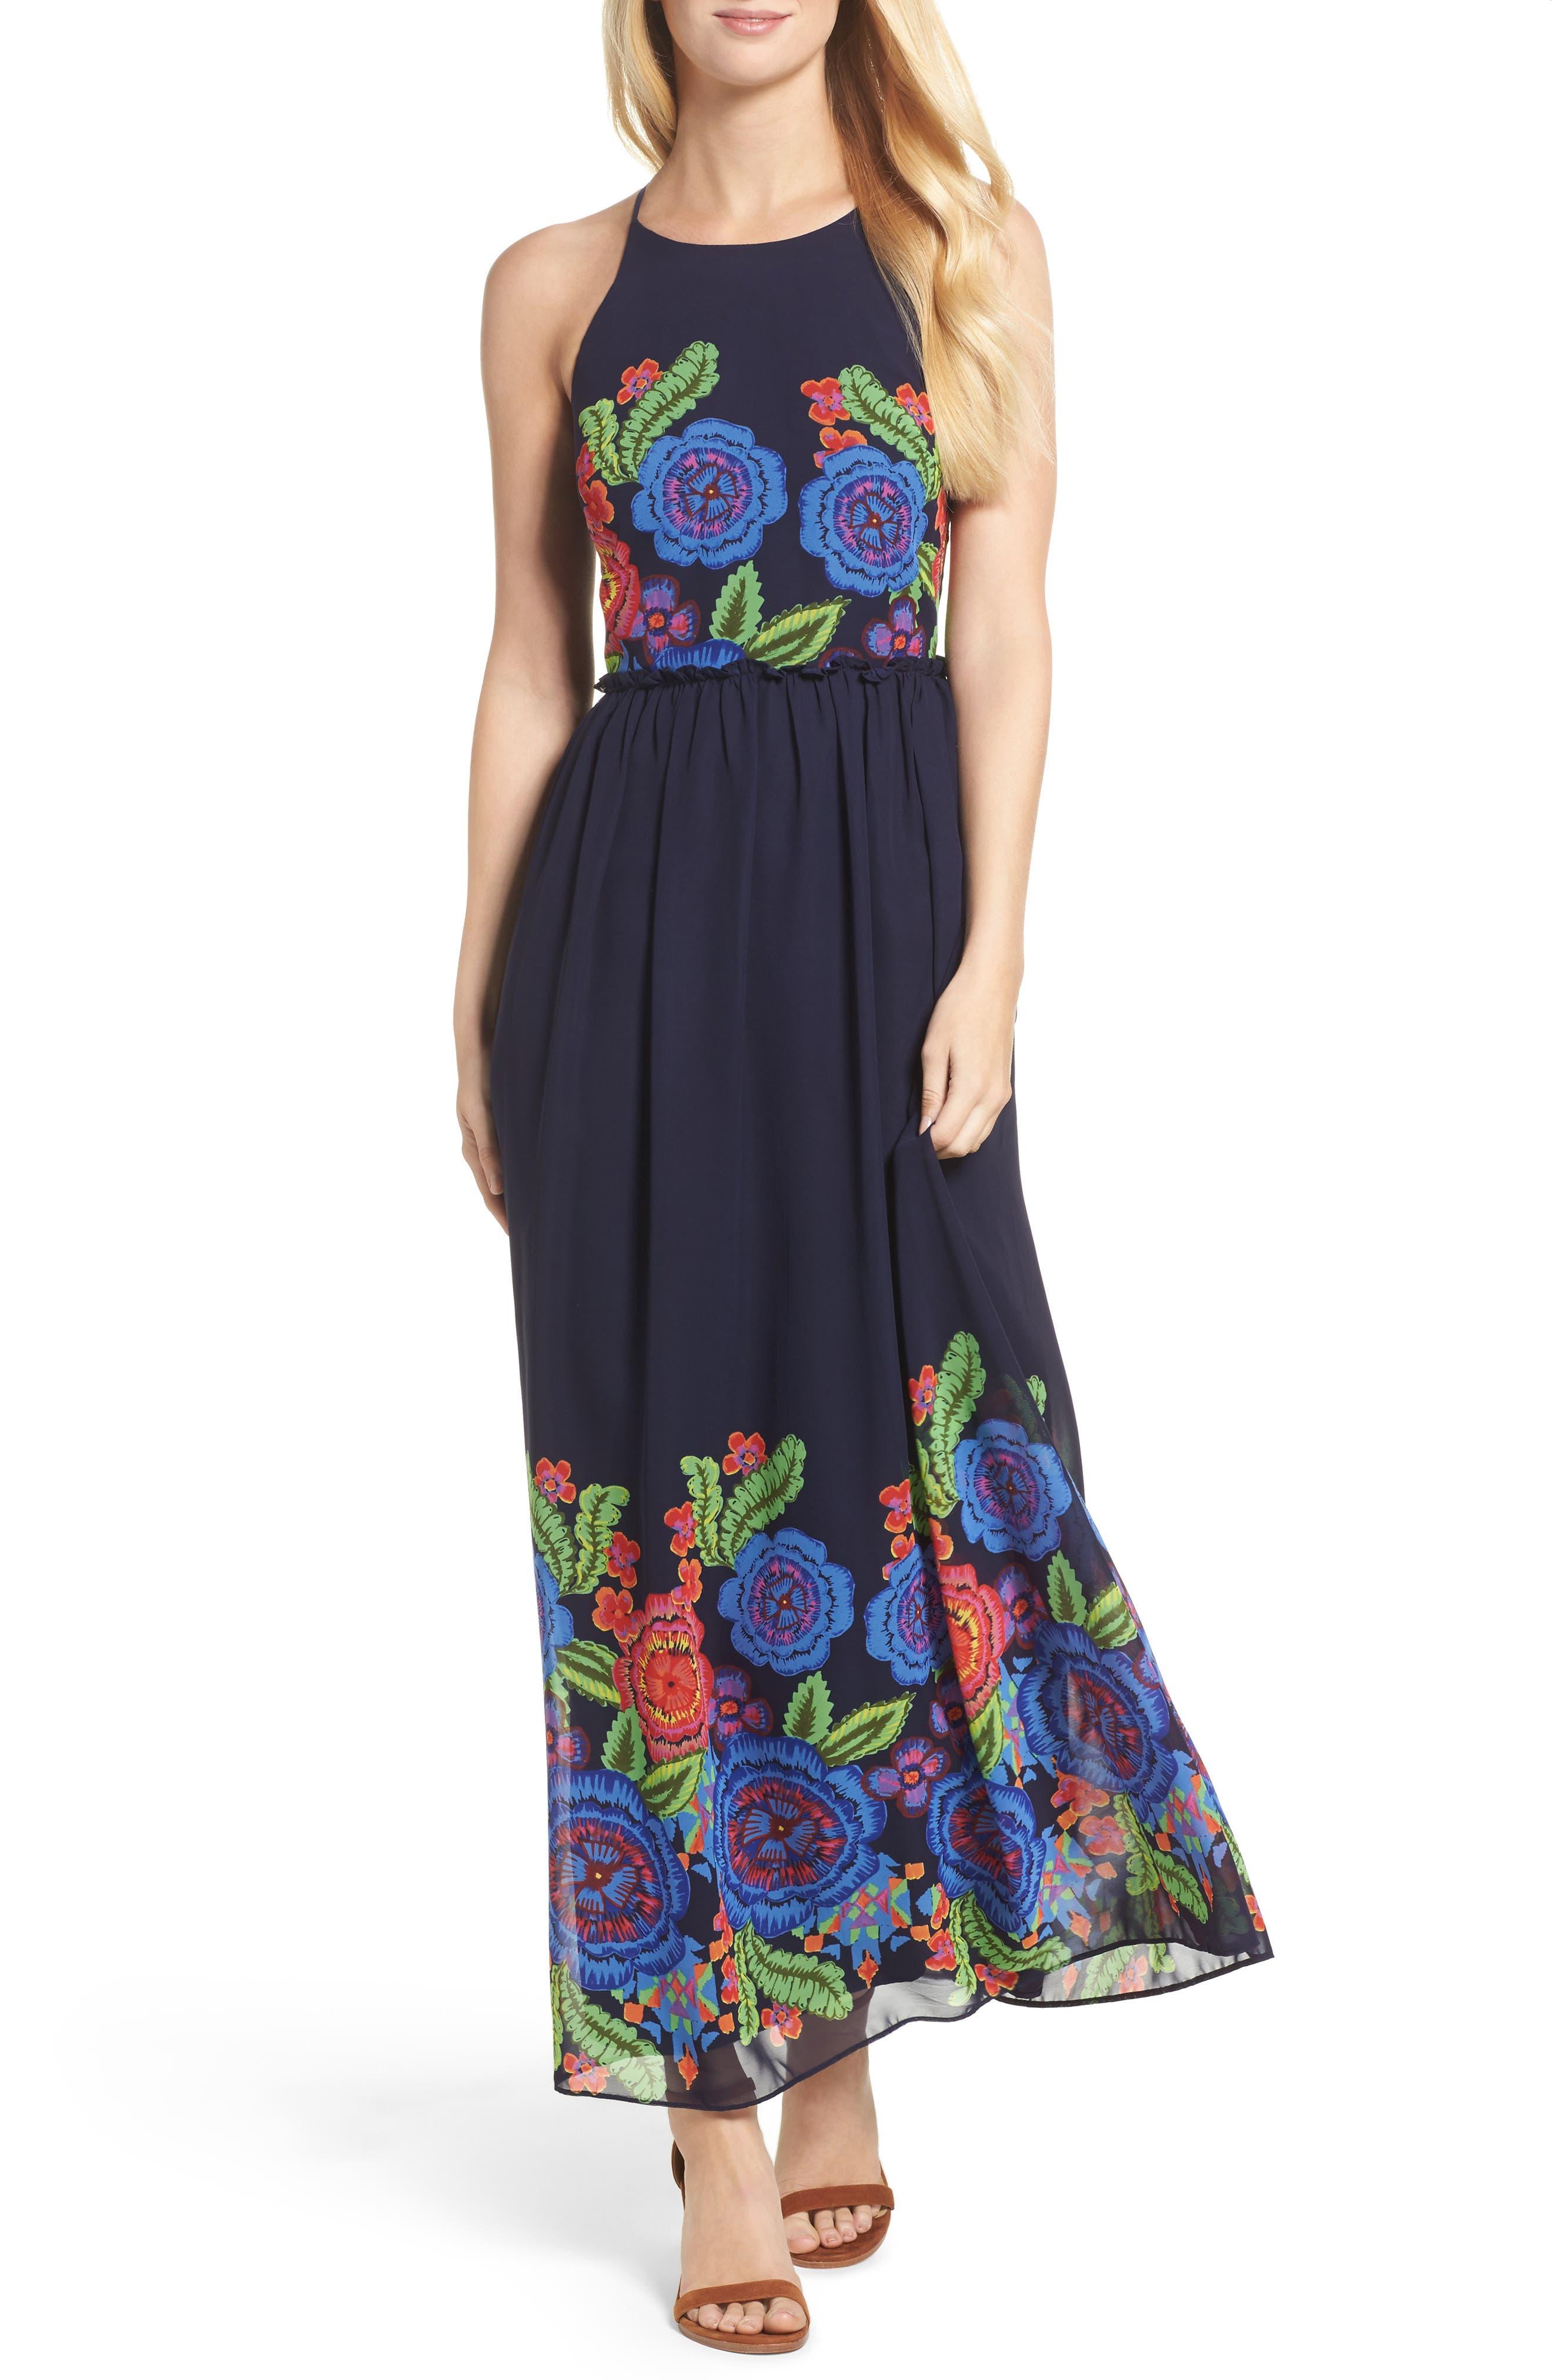 Zinnea Maxi Dress,                         Main,                         color, Navy Multi